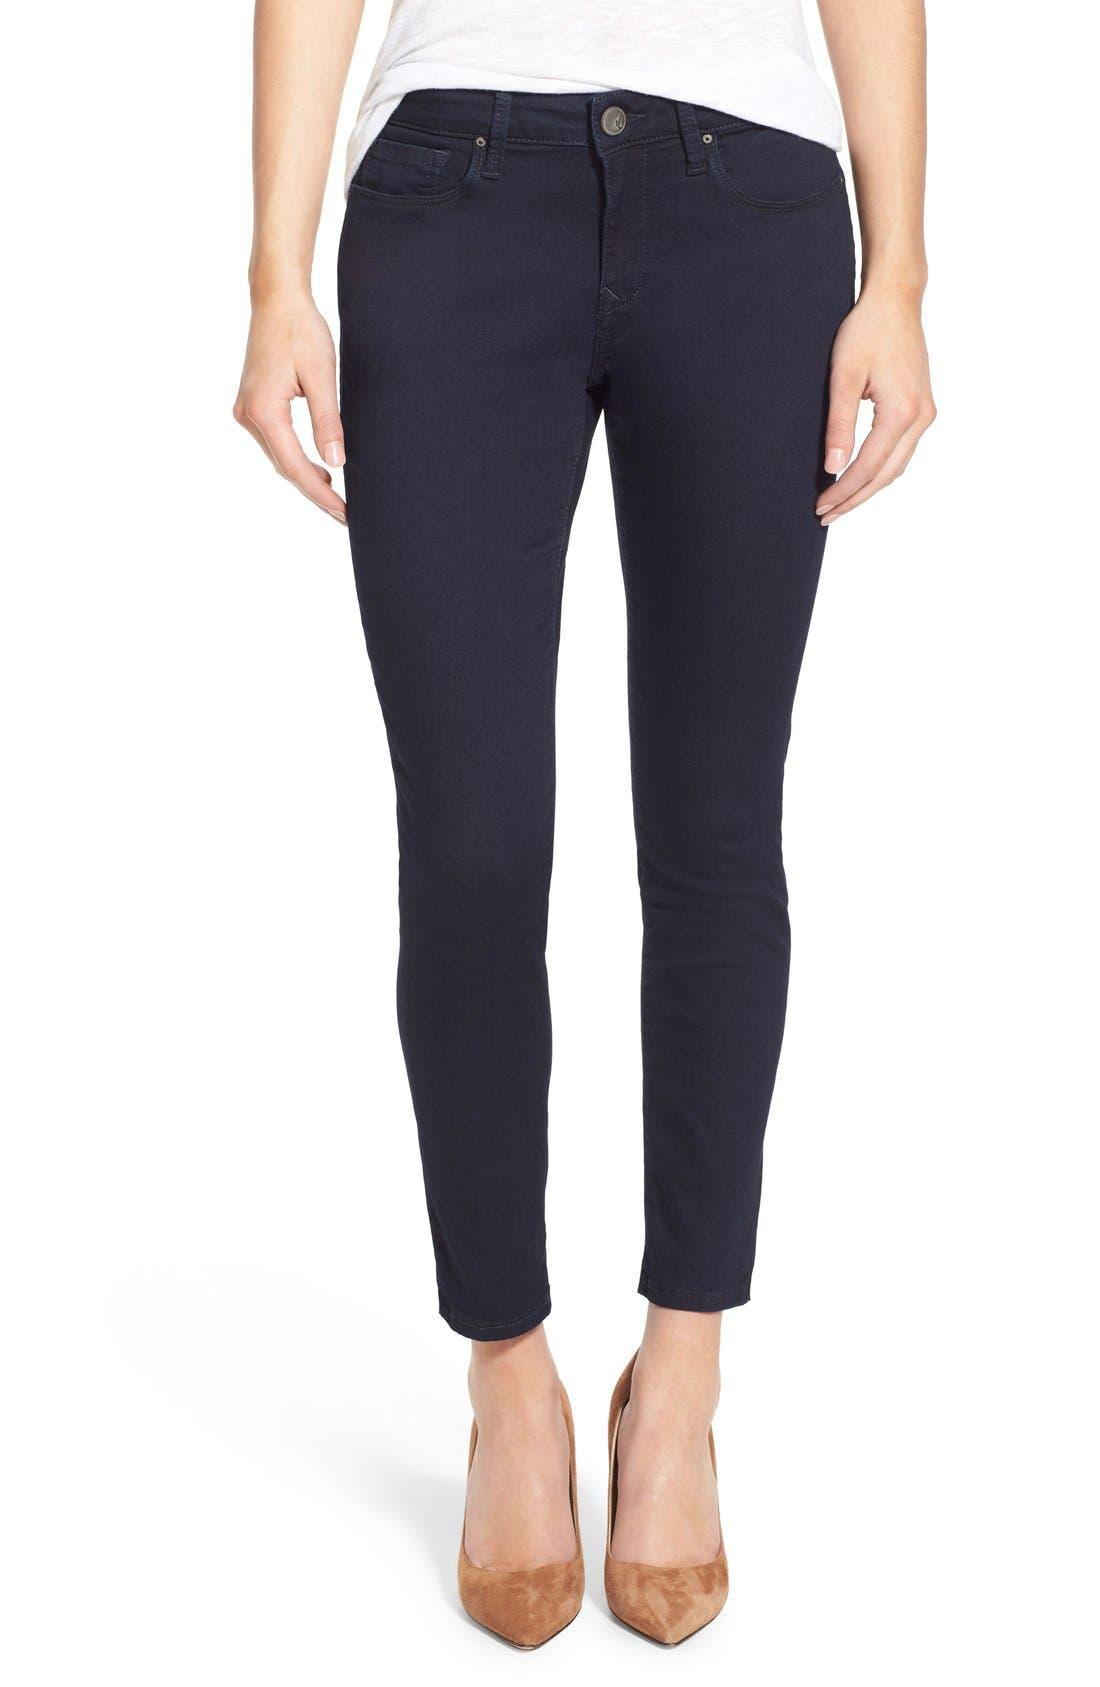 Alternate Image 1 Selected - Mavi Jeans 'Alexa' Stretch Skinny Jeans (Dark Shanti) (Petite)